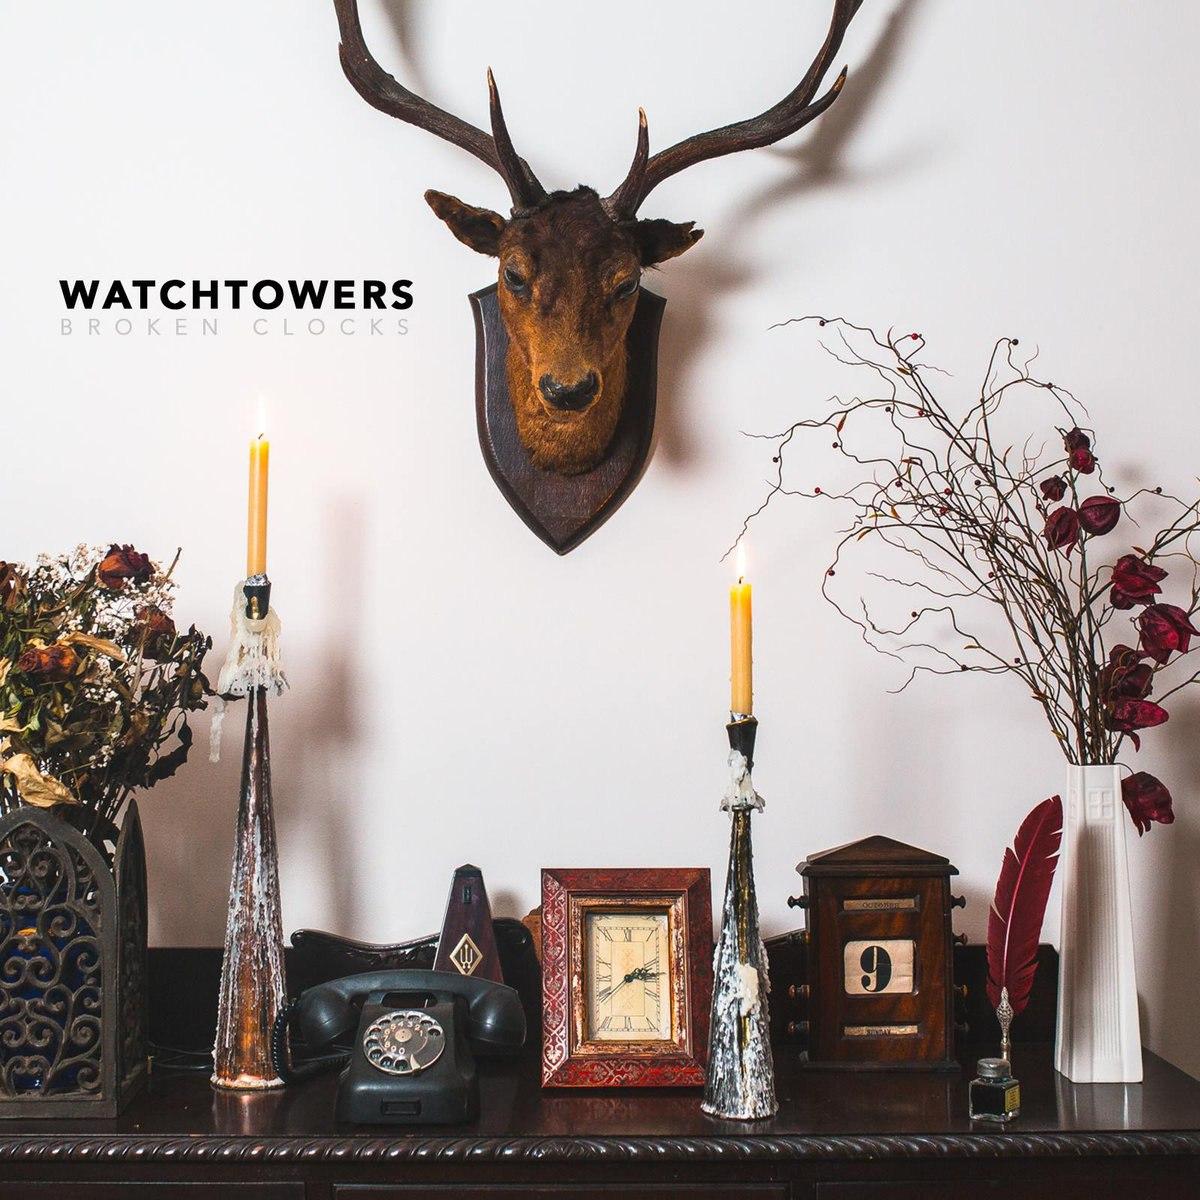 Watchtowers - Broken Clocks [single] (2016)